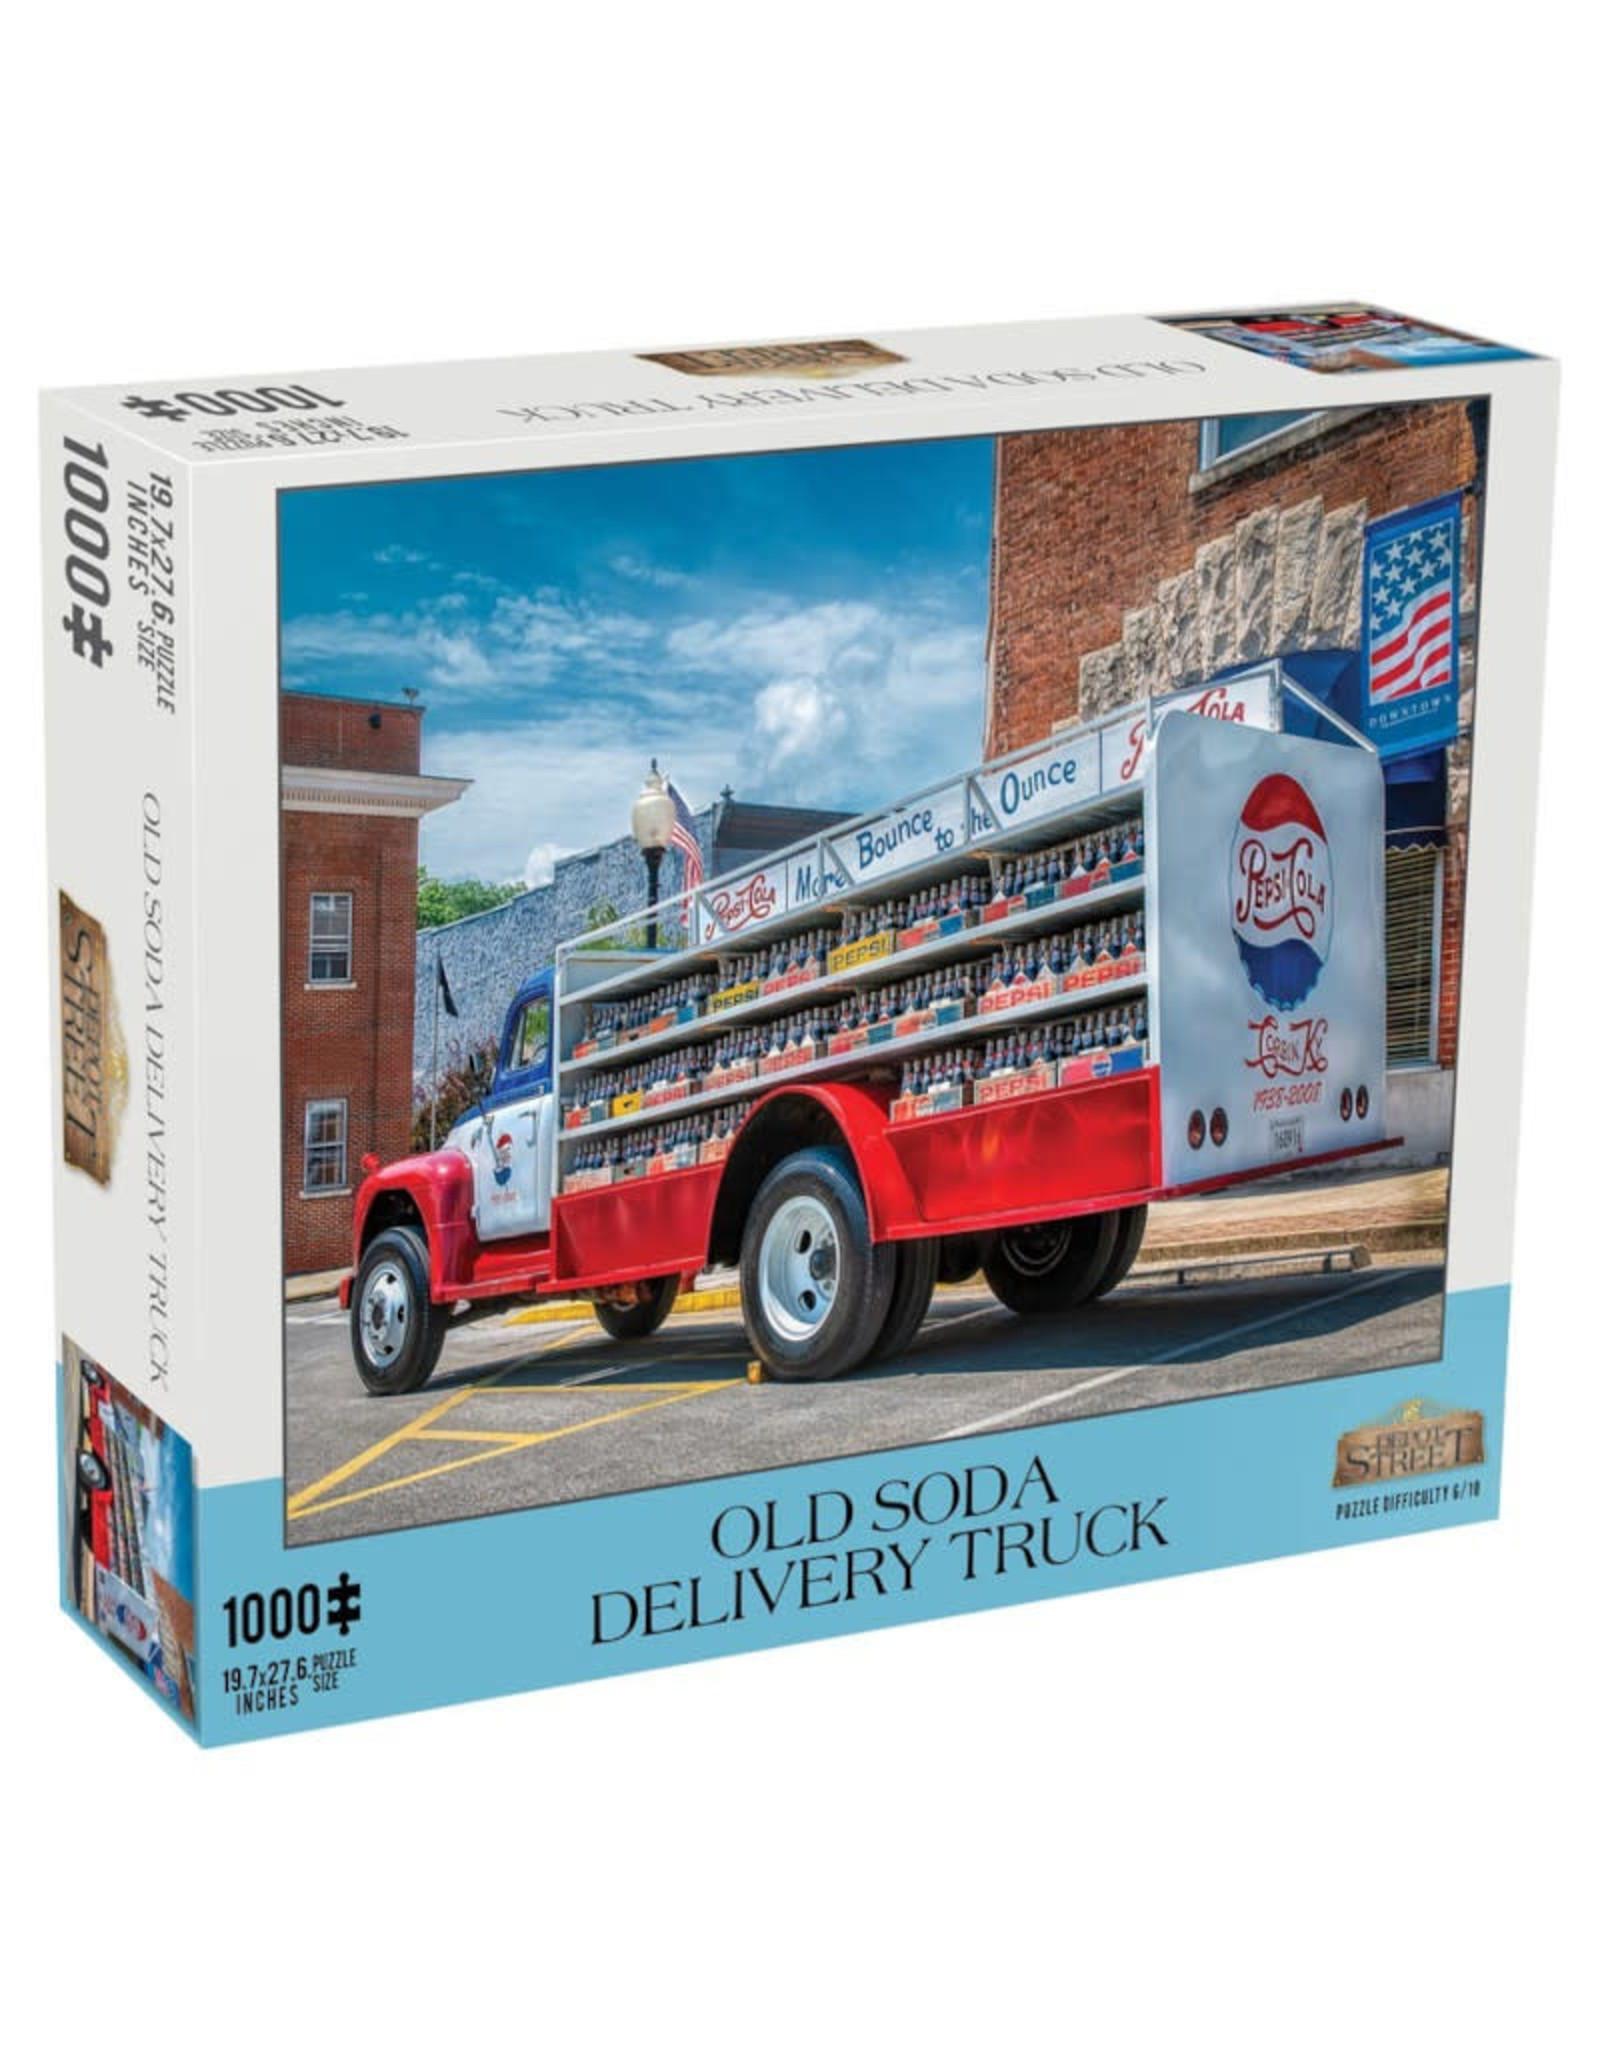 Mchezo Old Soda Delivery Truck Puzzle 1000 PCS